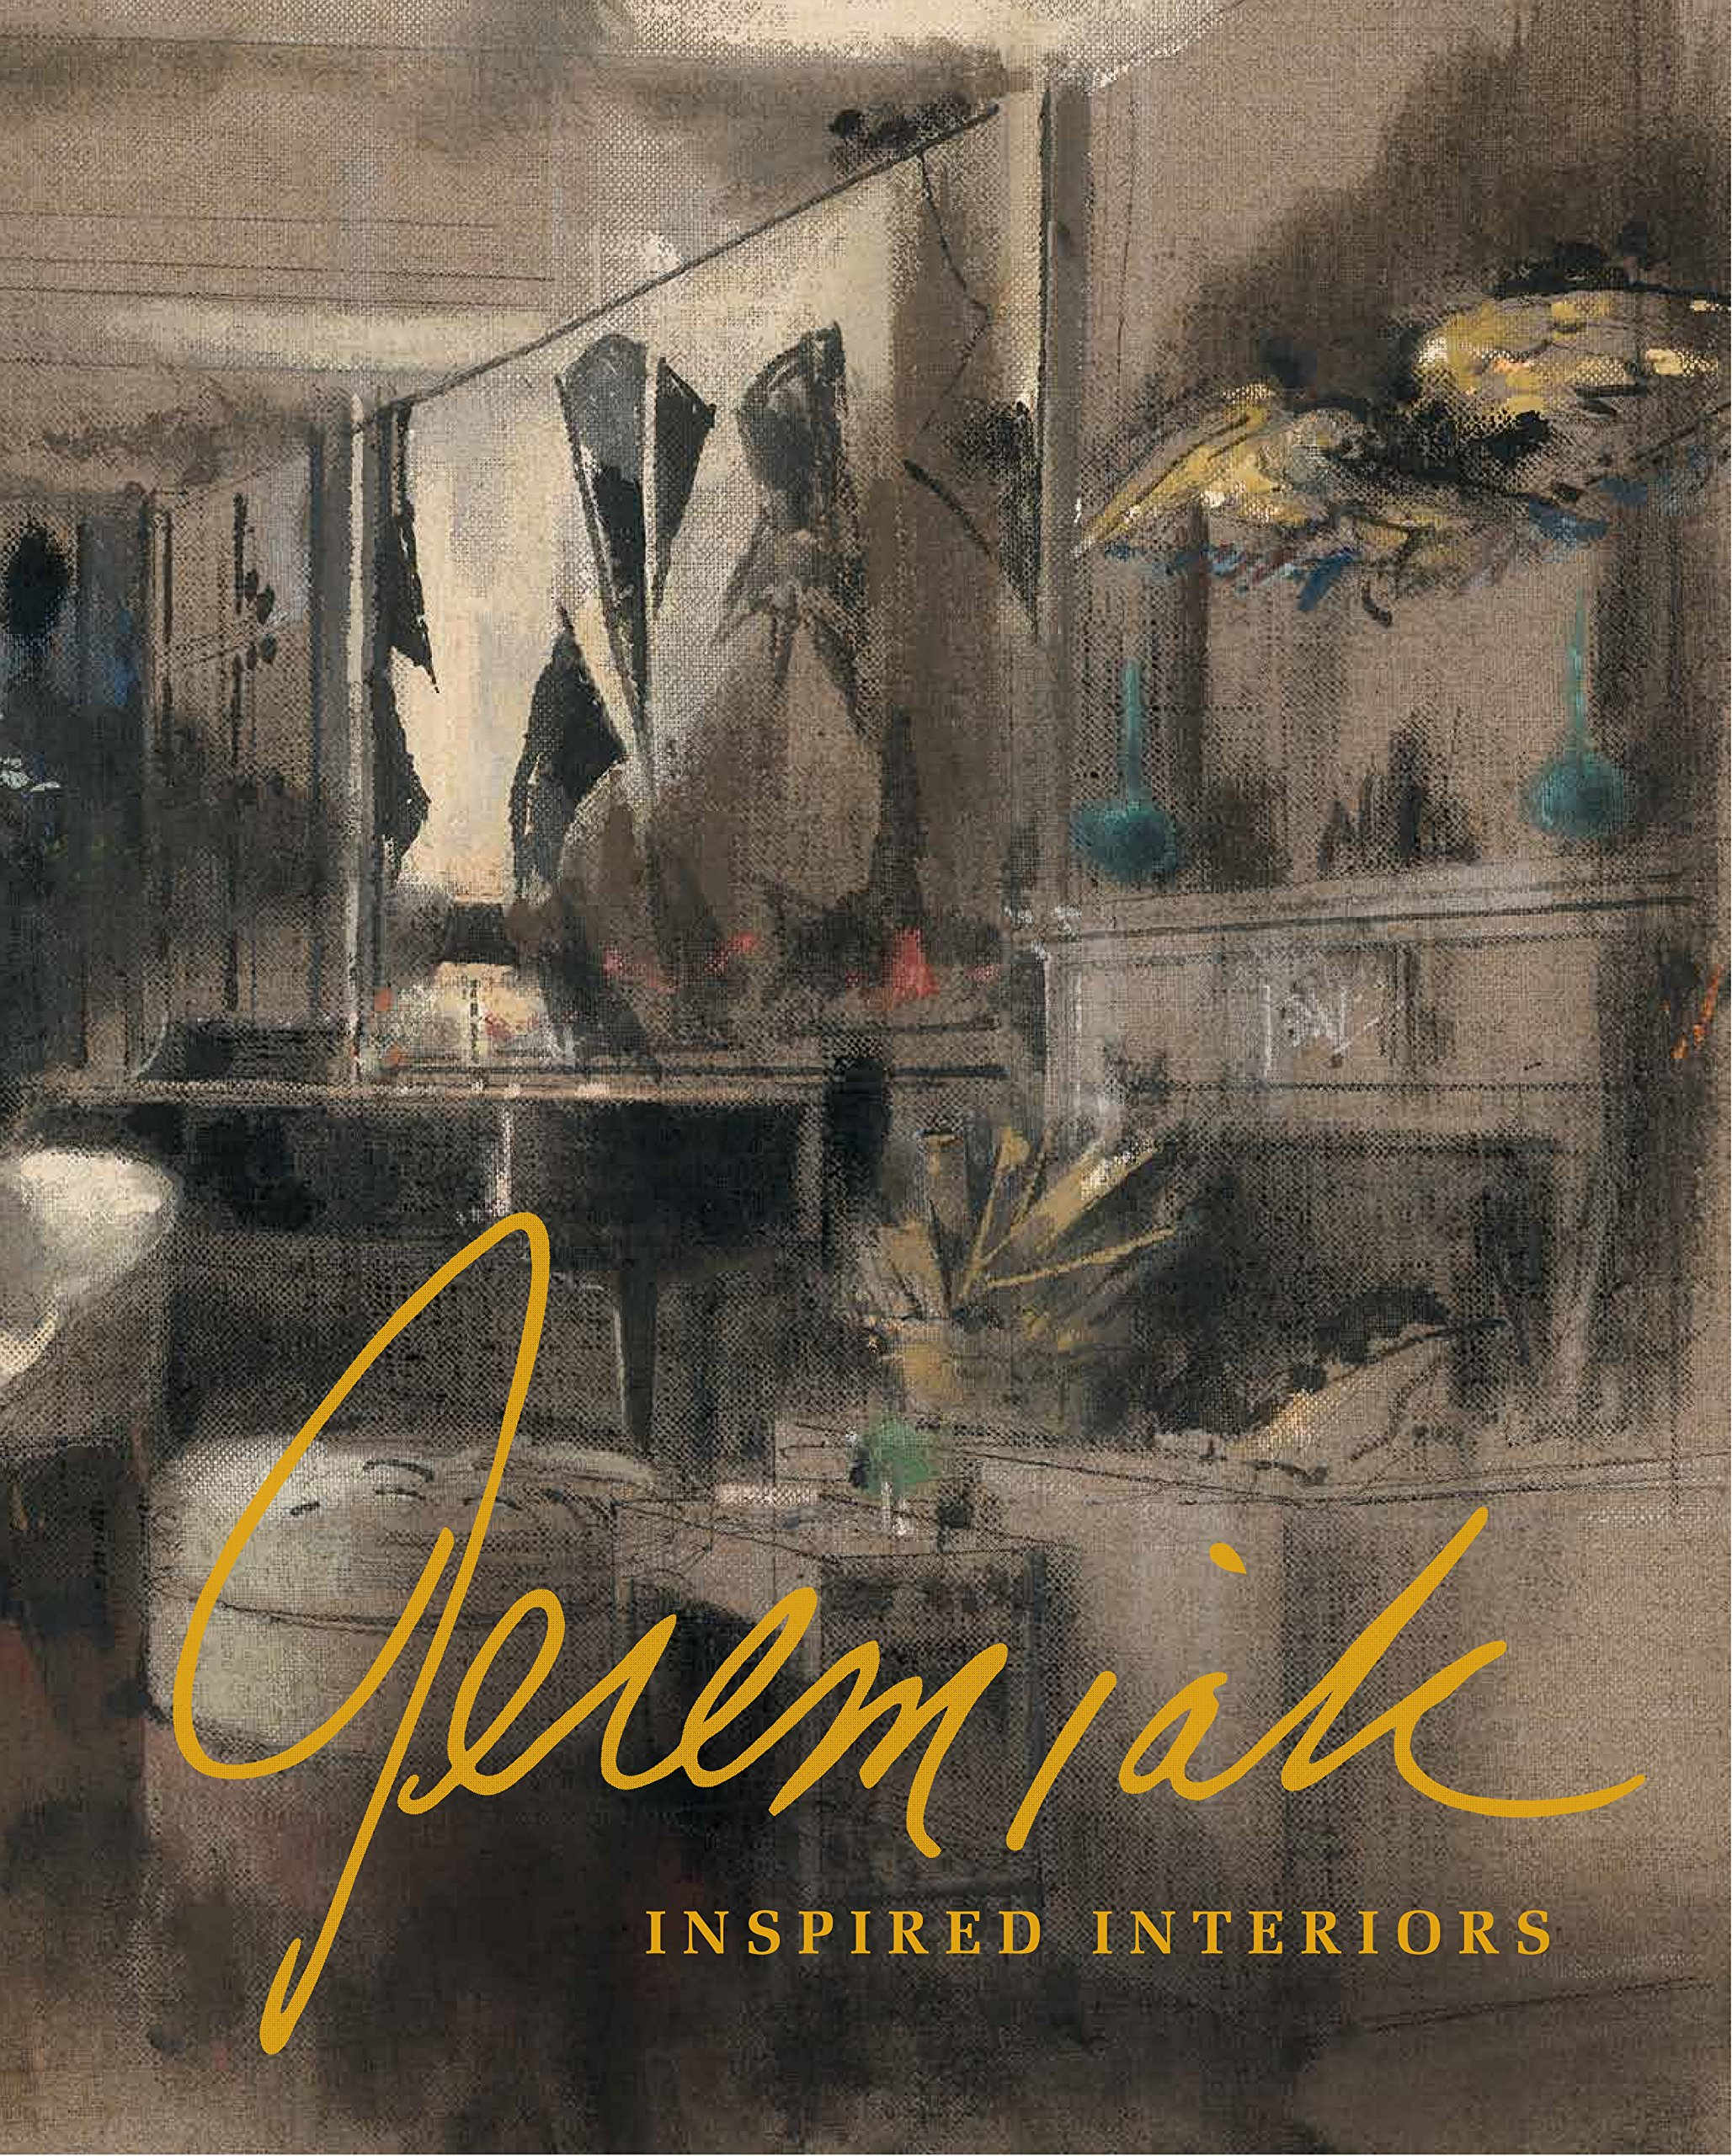 Jeremiah Goodman: Inspired Interiors